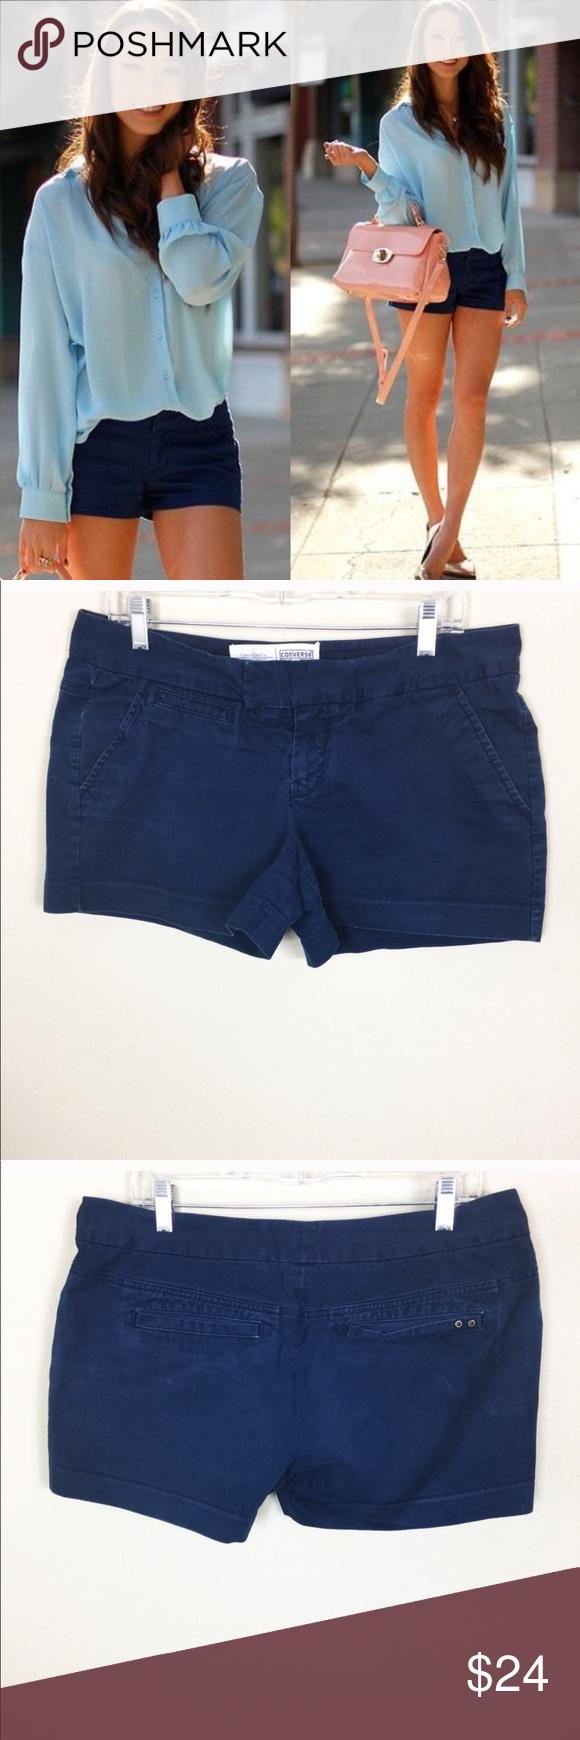 Converse Navy Blue Shorts Navy Blue Shorts Blue Converse Blue Shorts,White Bathroom With Subway Tile